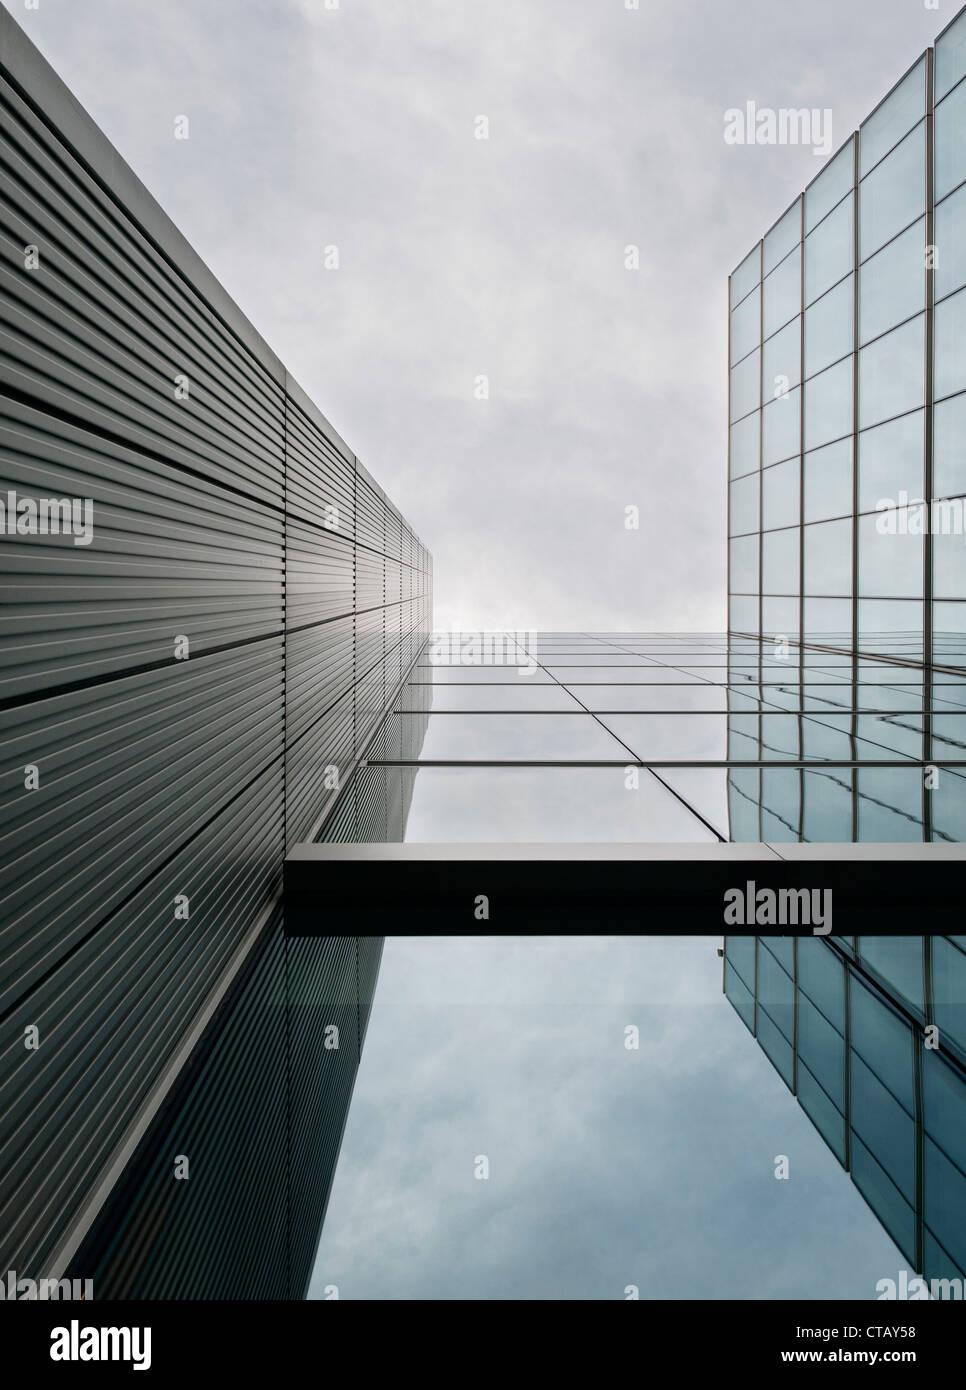 Modern architecture, New London, London, capital, England, UK - Stock Image